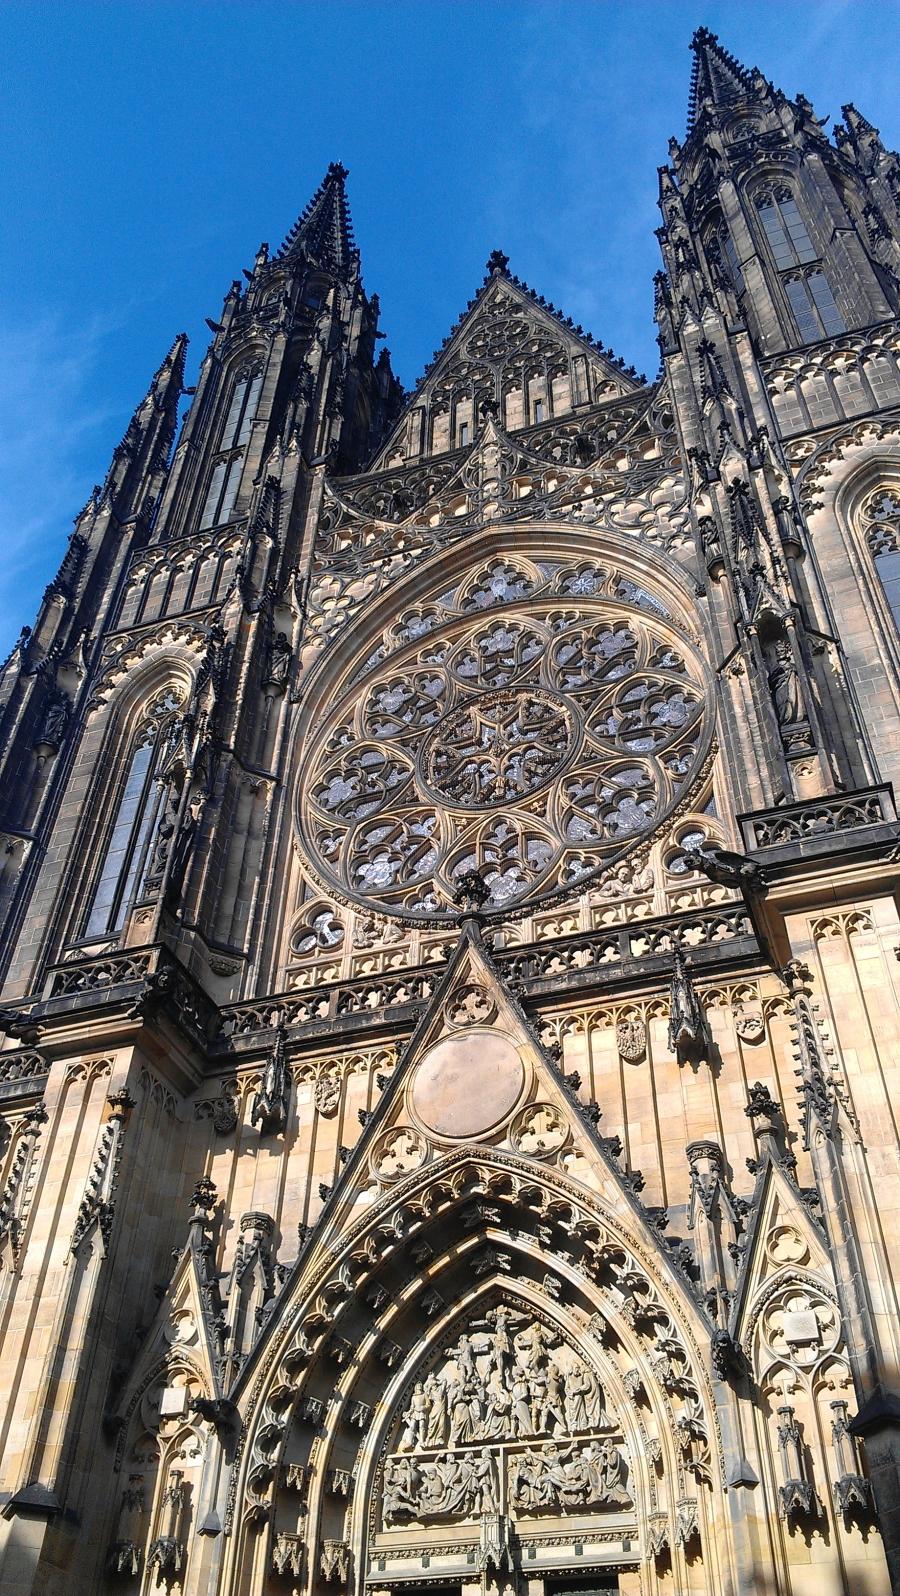 St. Vitus's Cathedral facade, Prague, Czech Republic.